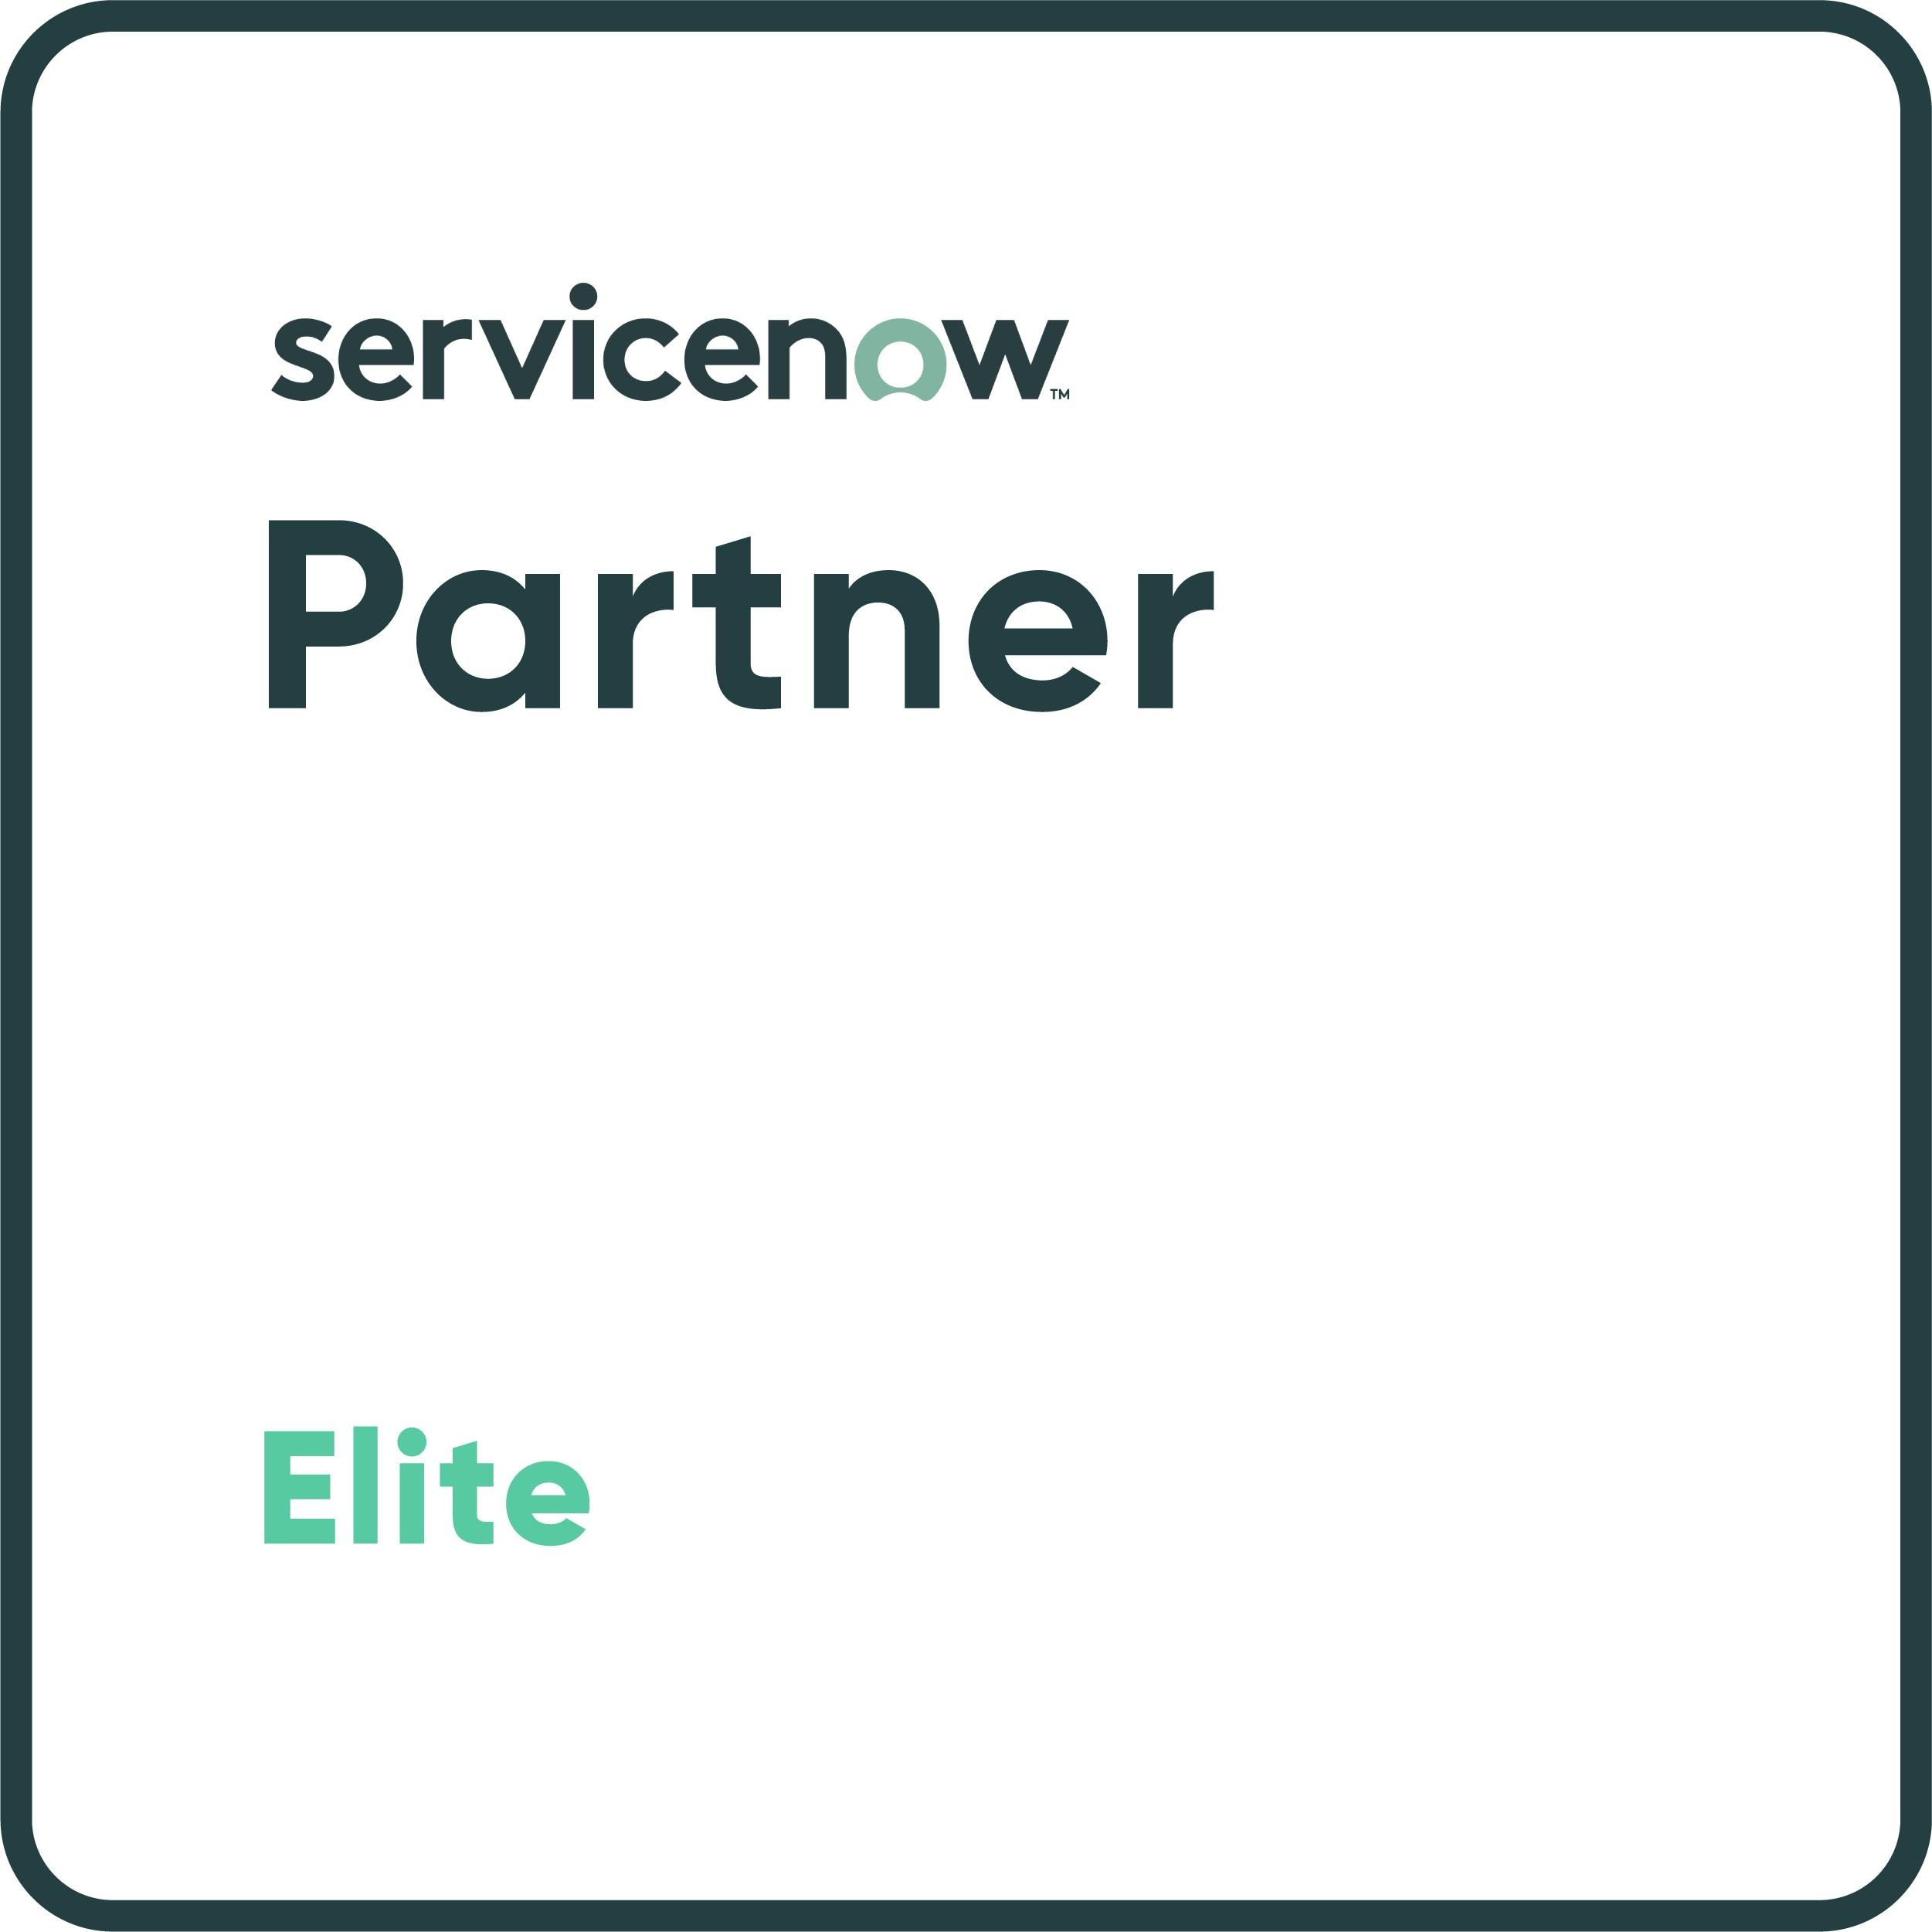 ServiceNow Elite Partner Badge JPG